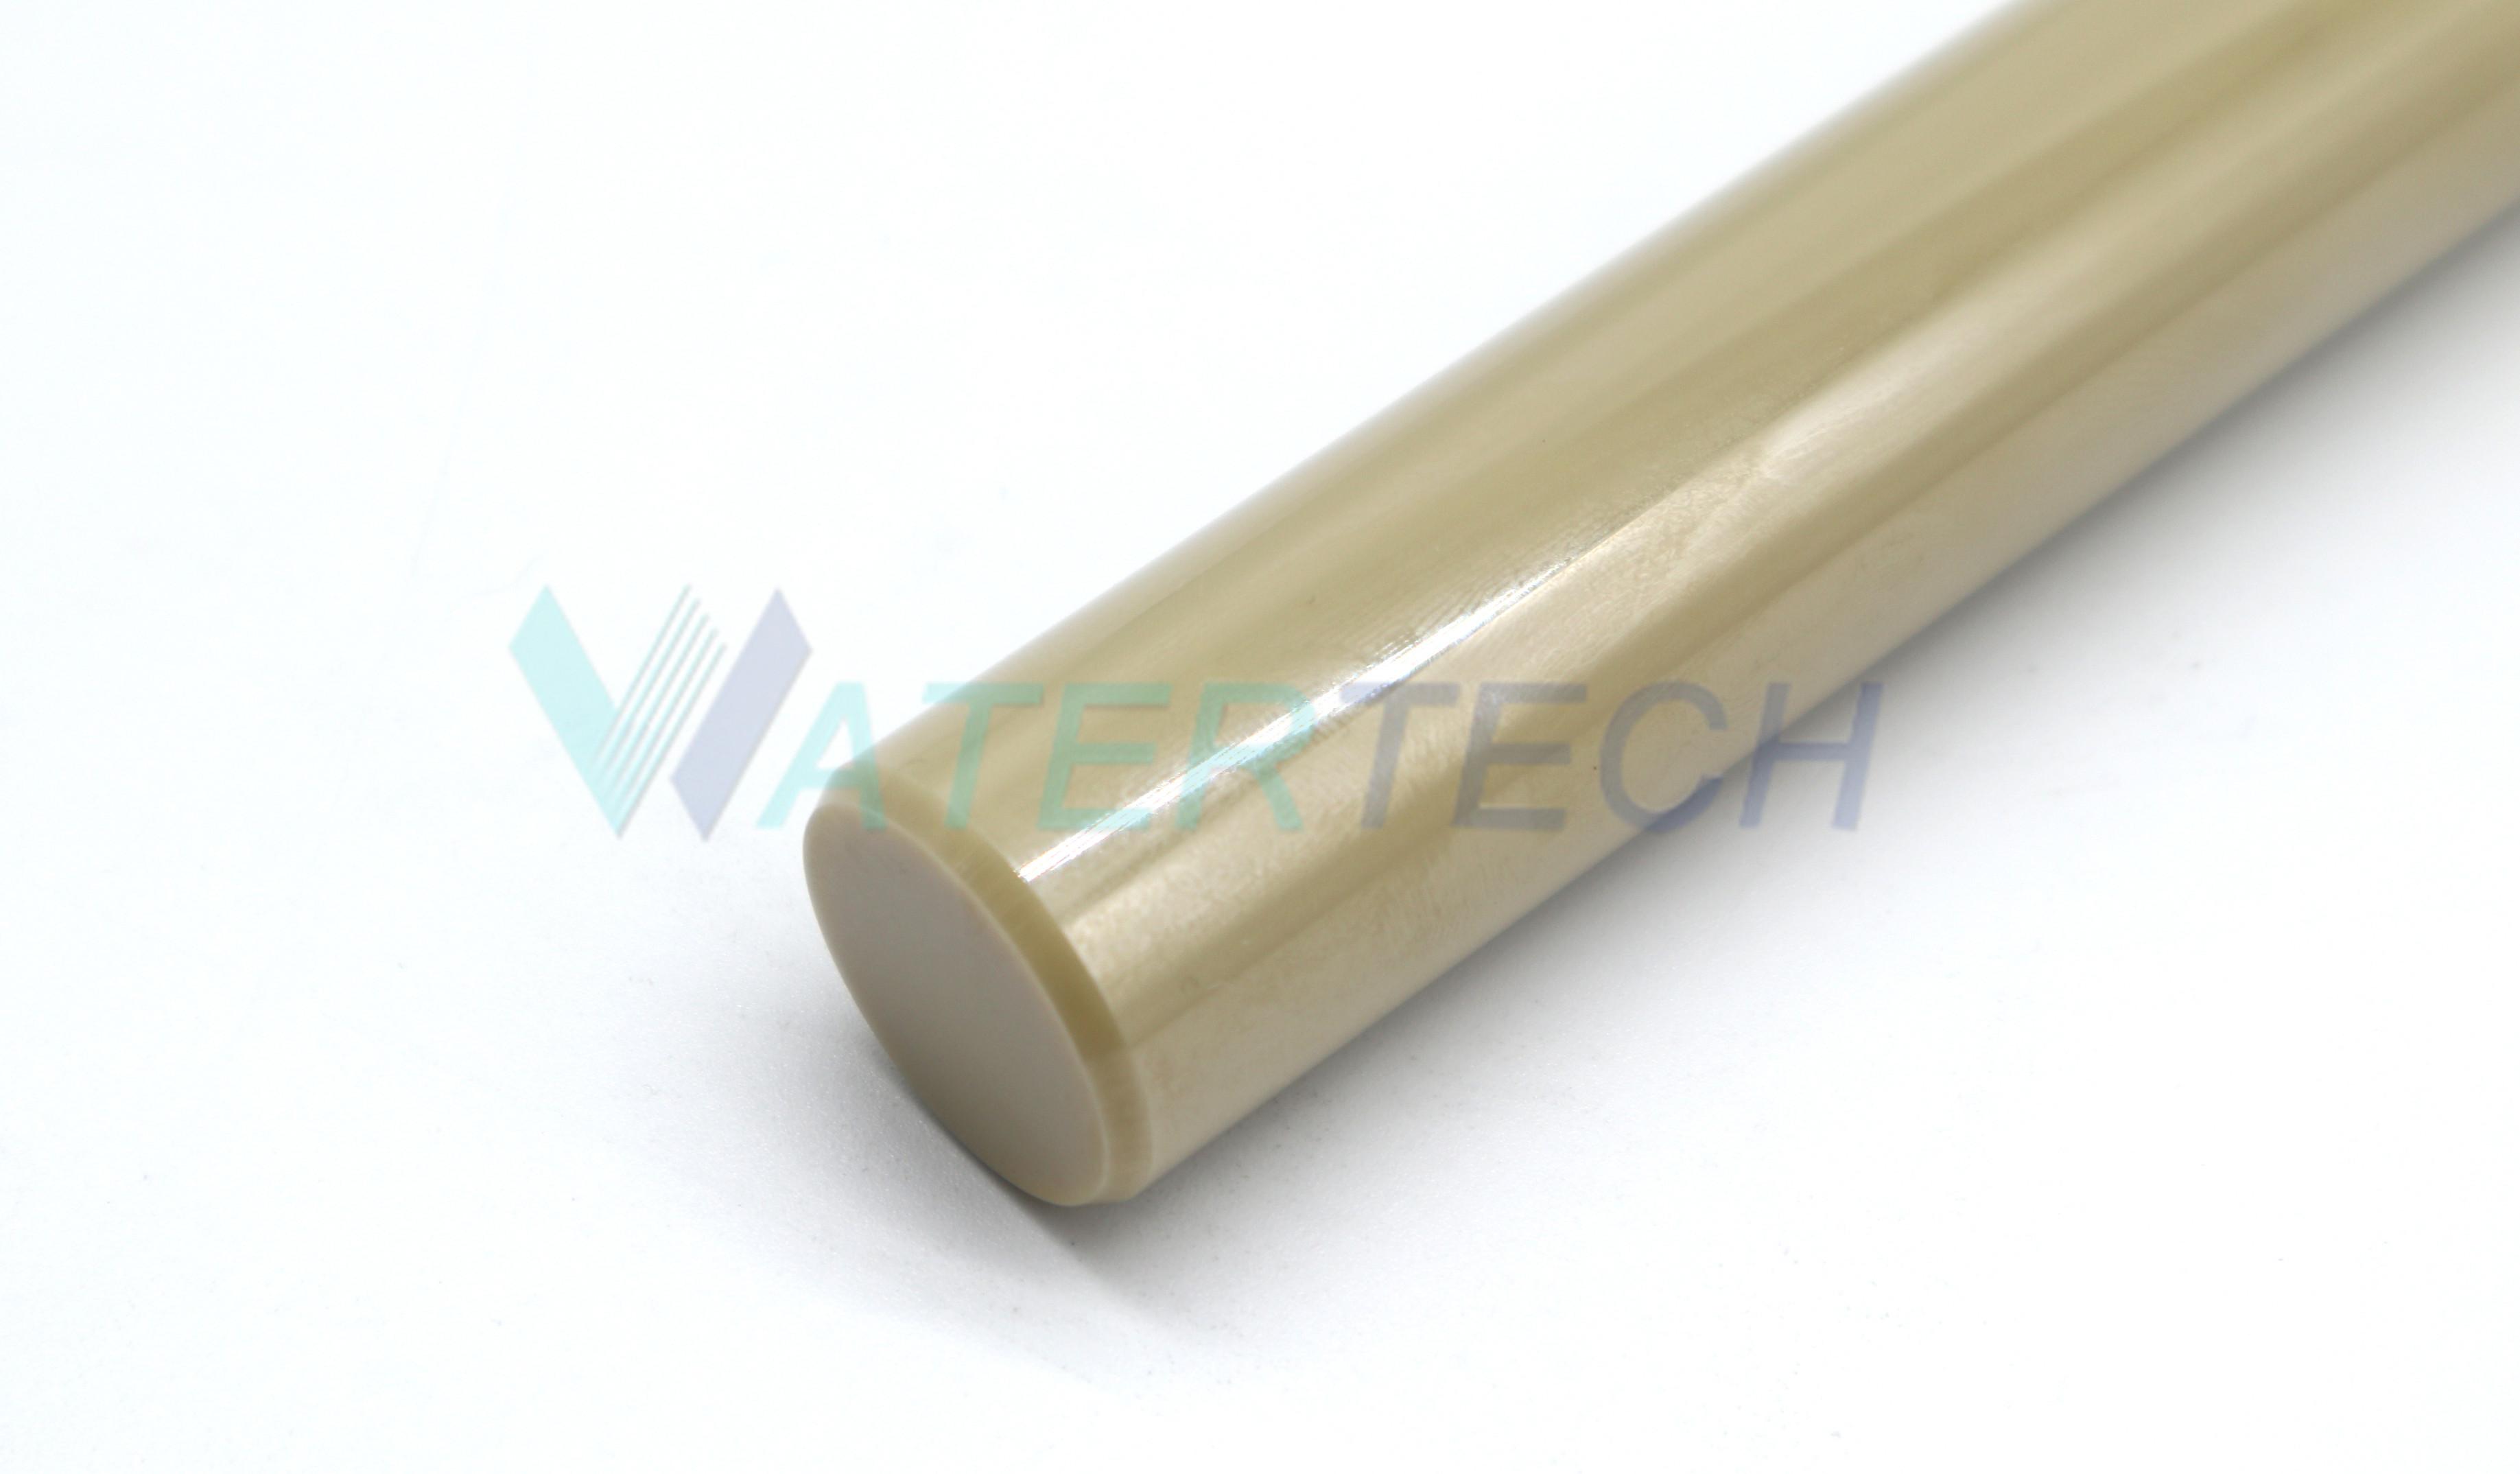 WT 010253-1 waterjet ceramic plunger